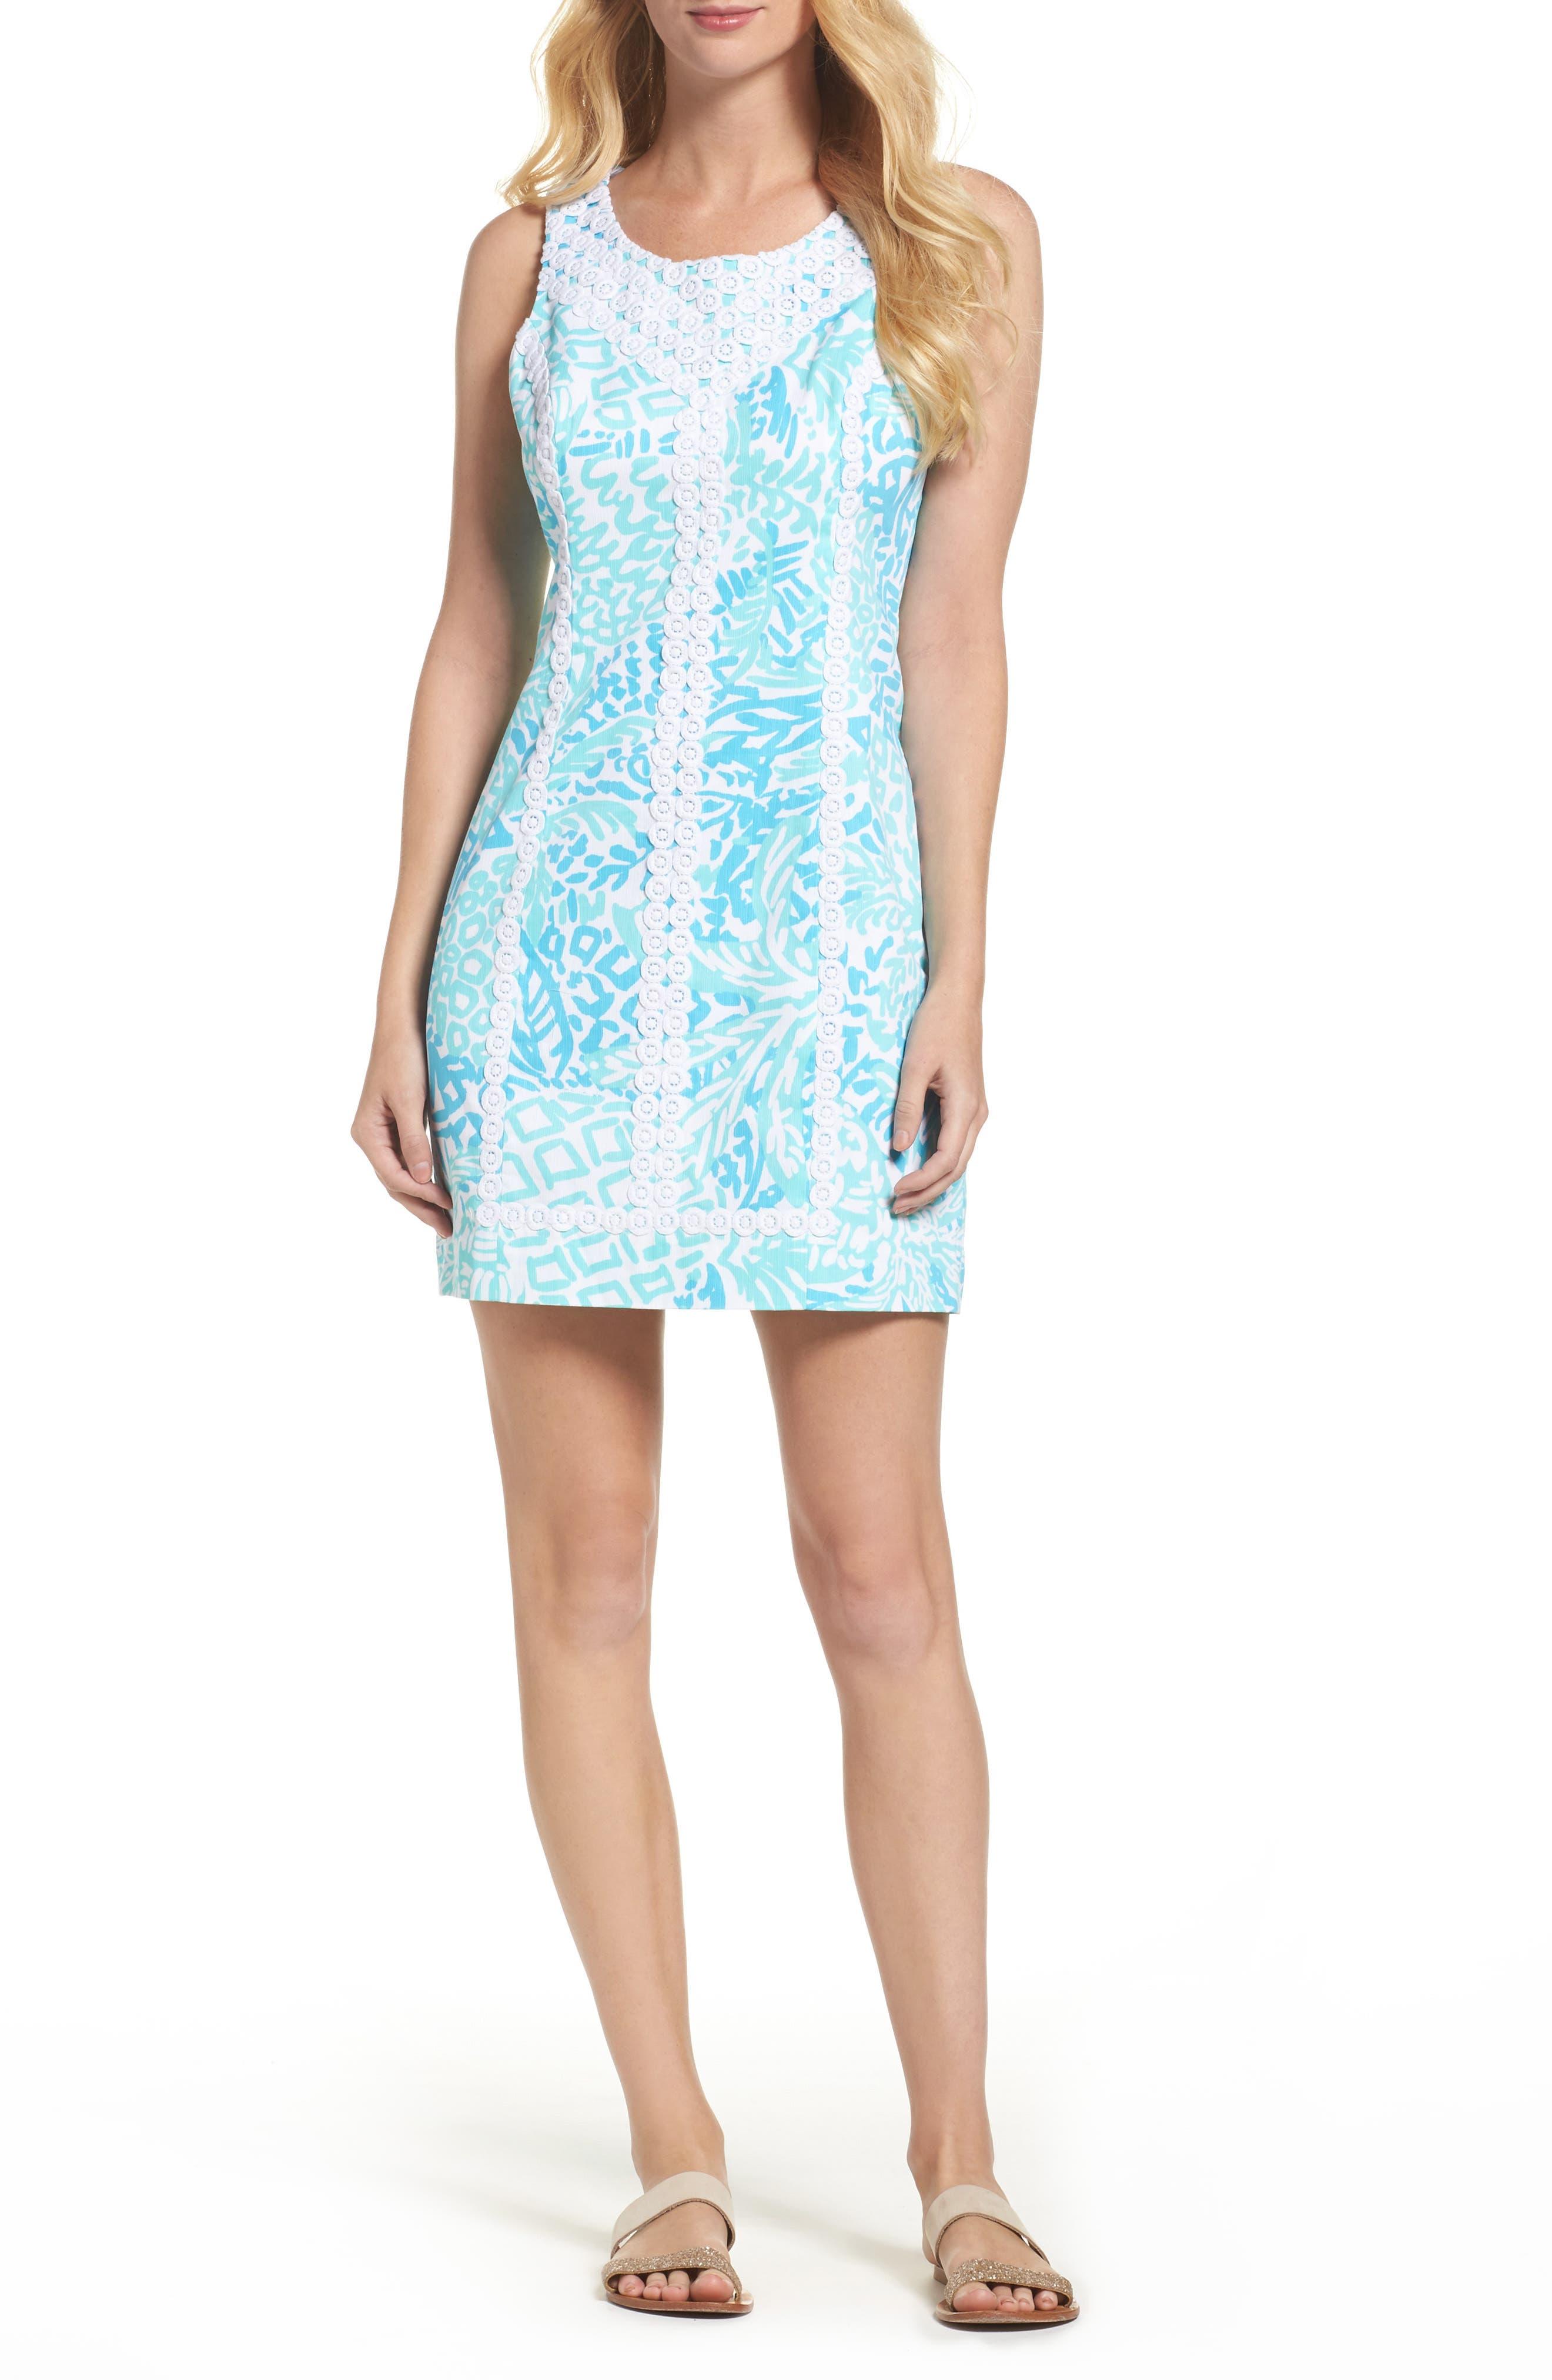 McFarlane Sheath dress,                             Main thumbnail 1, color,                             436